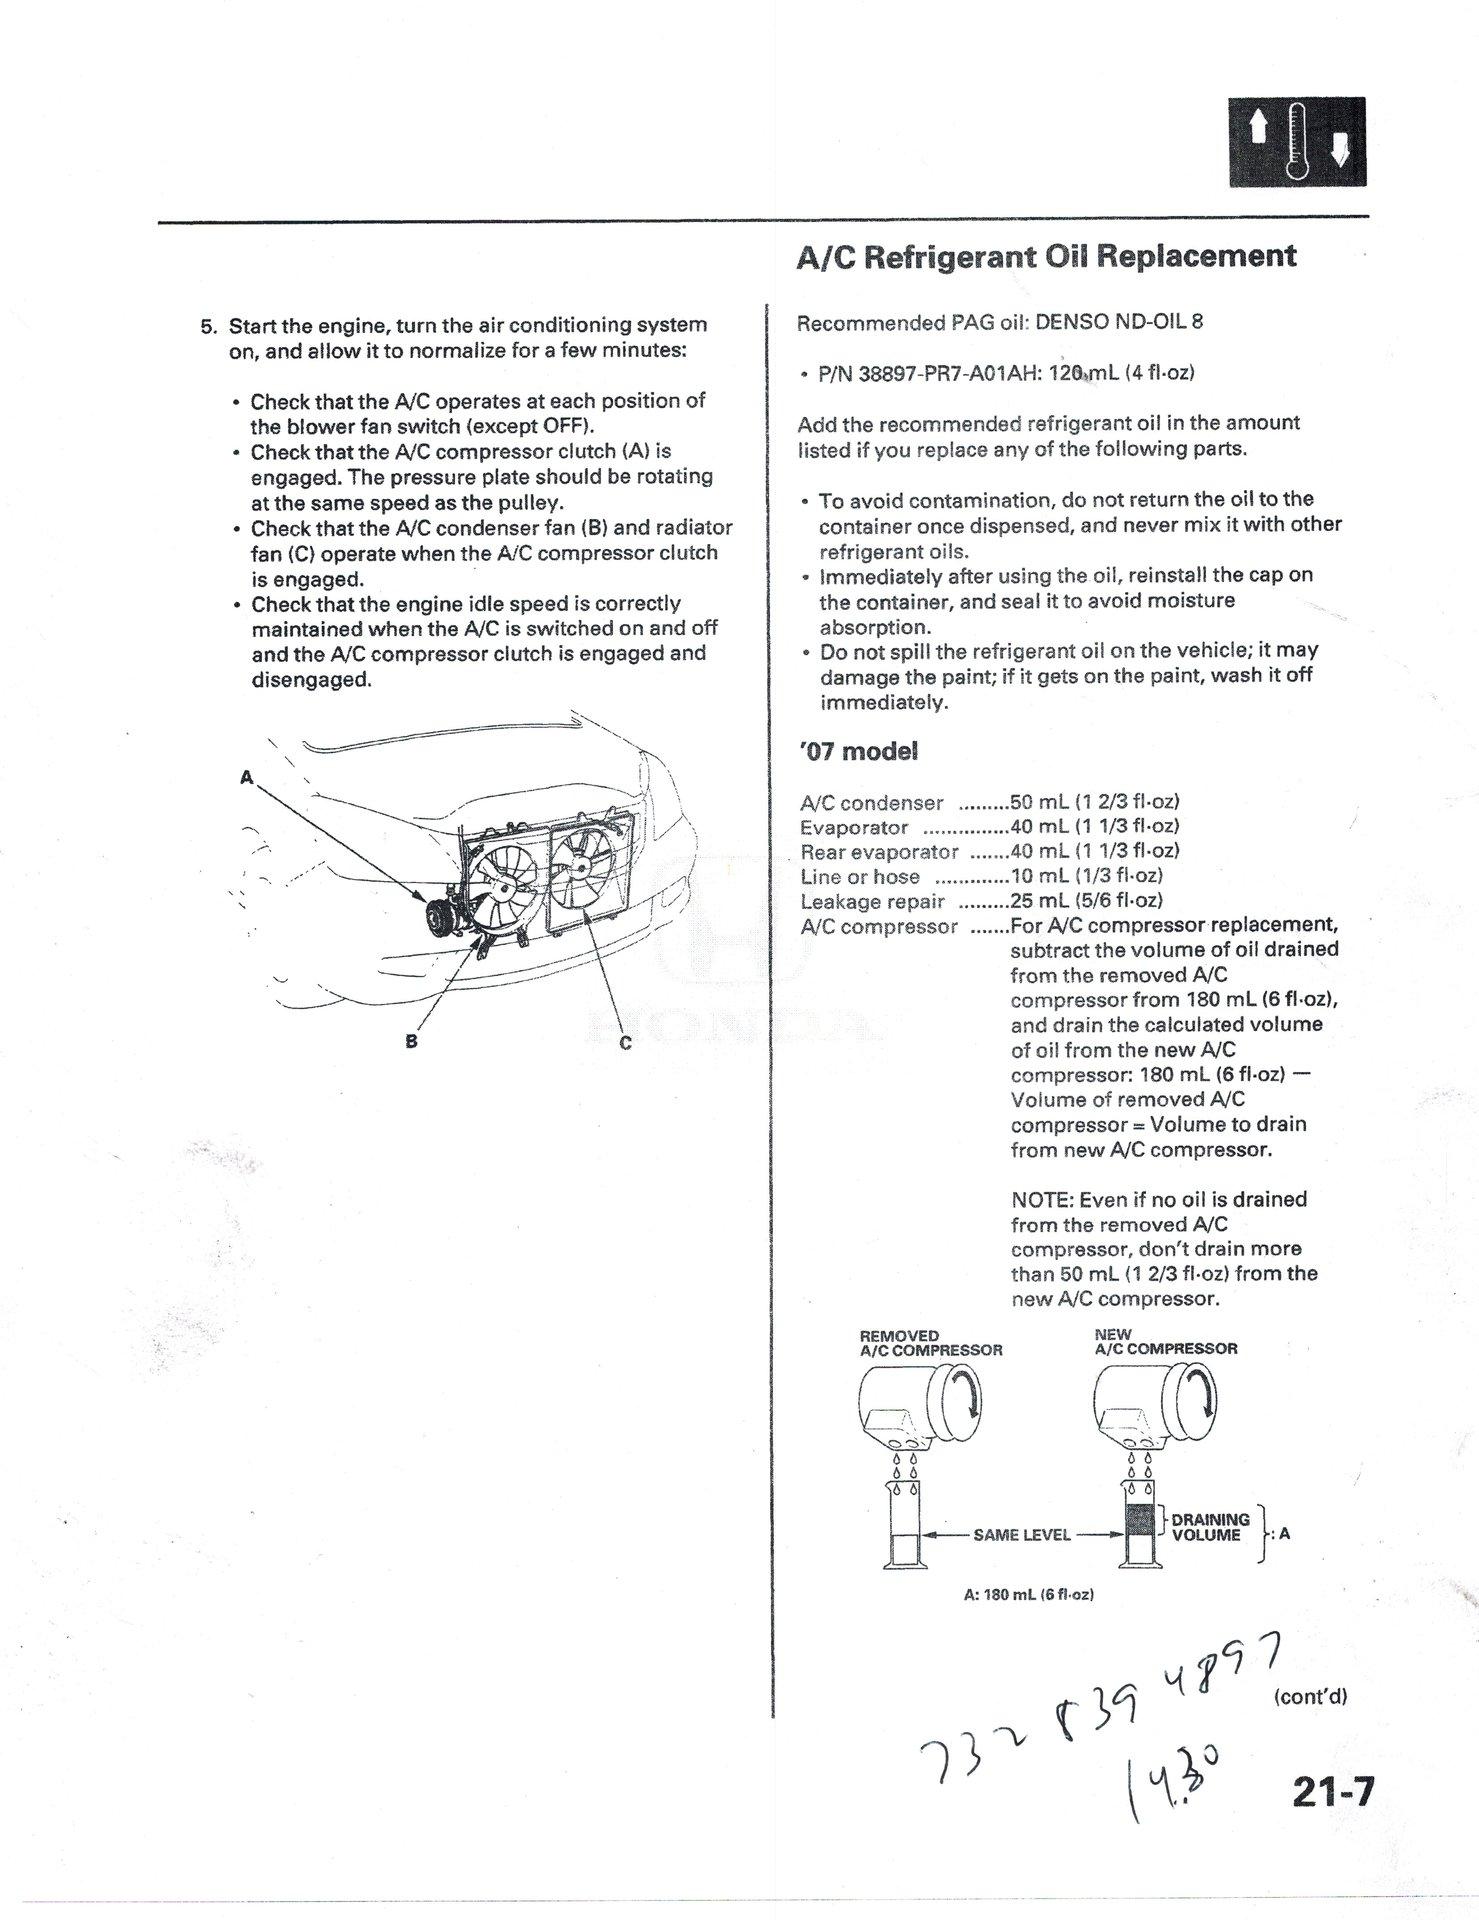 Adding PAG Oil | Honda Odyssey Forum